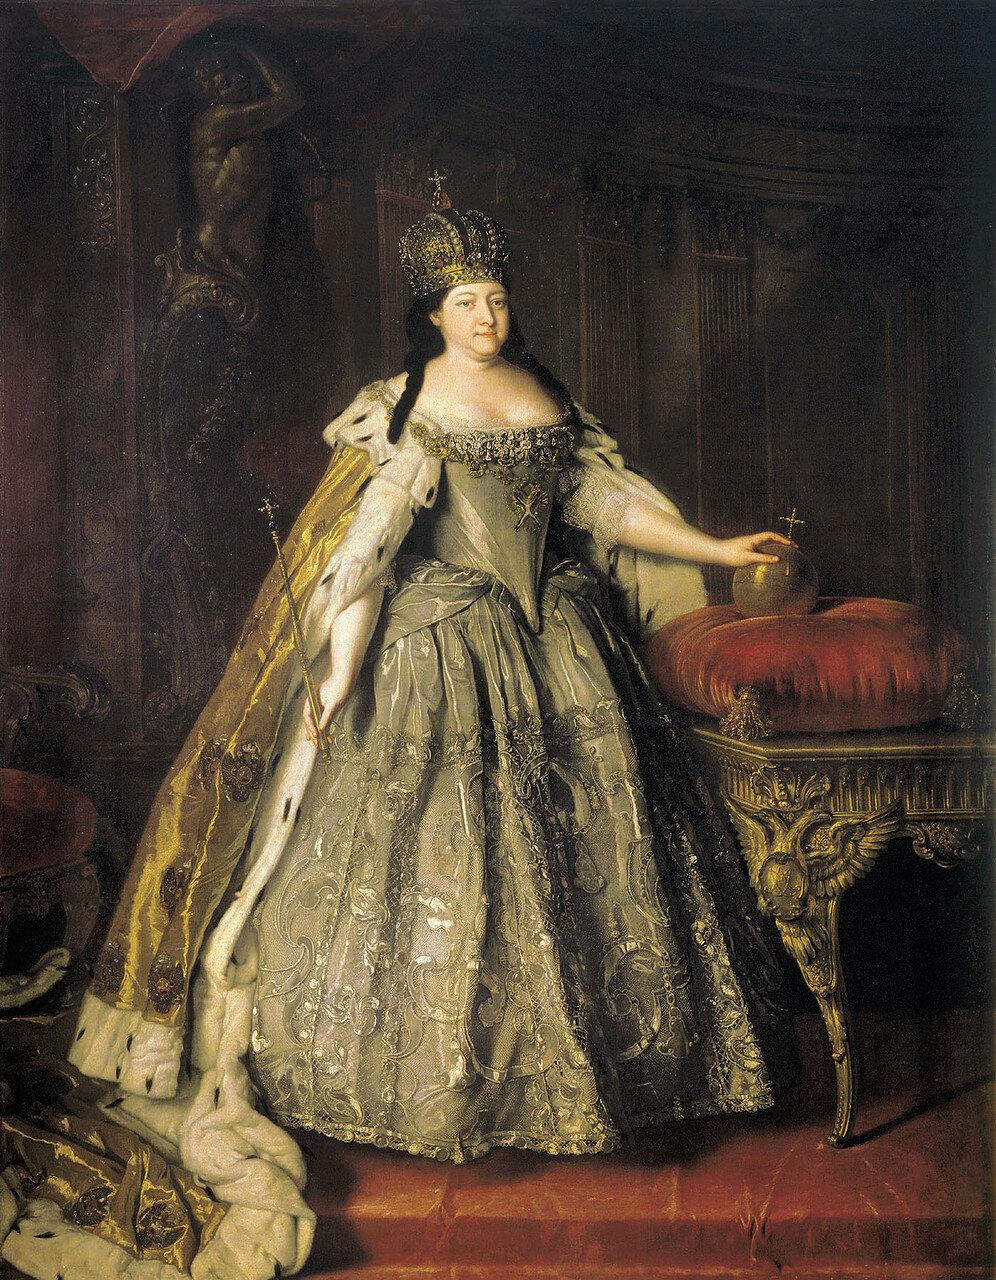 Louis_Caravaque,_Portrait_of_Empress_Anna_Ioannovna_(1730).jpg